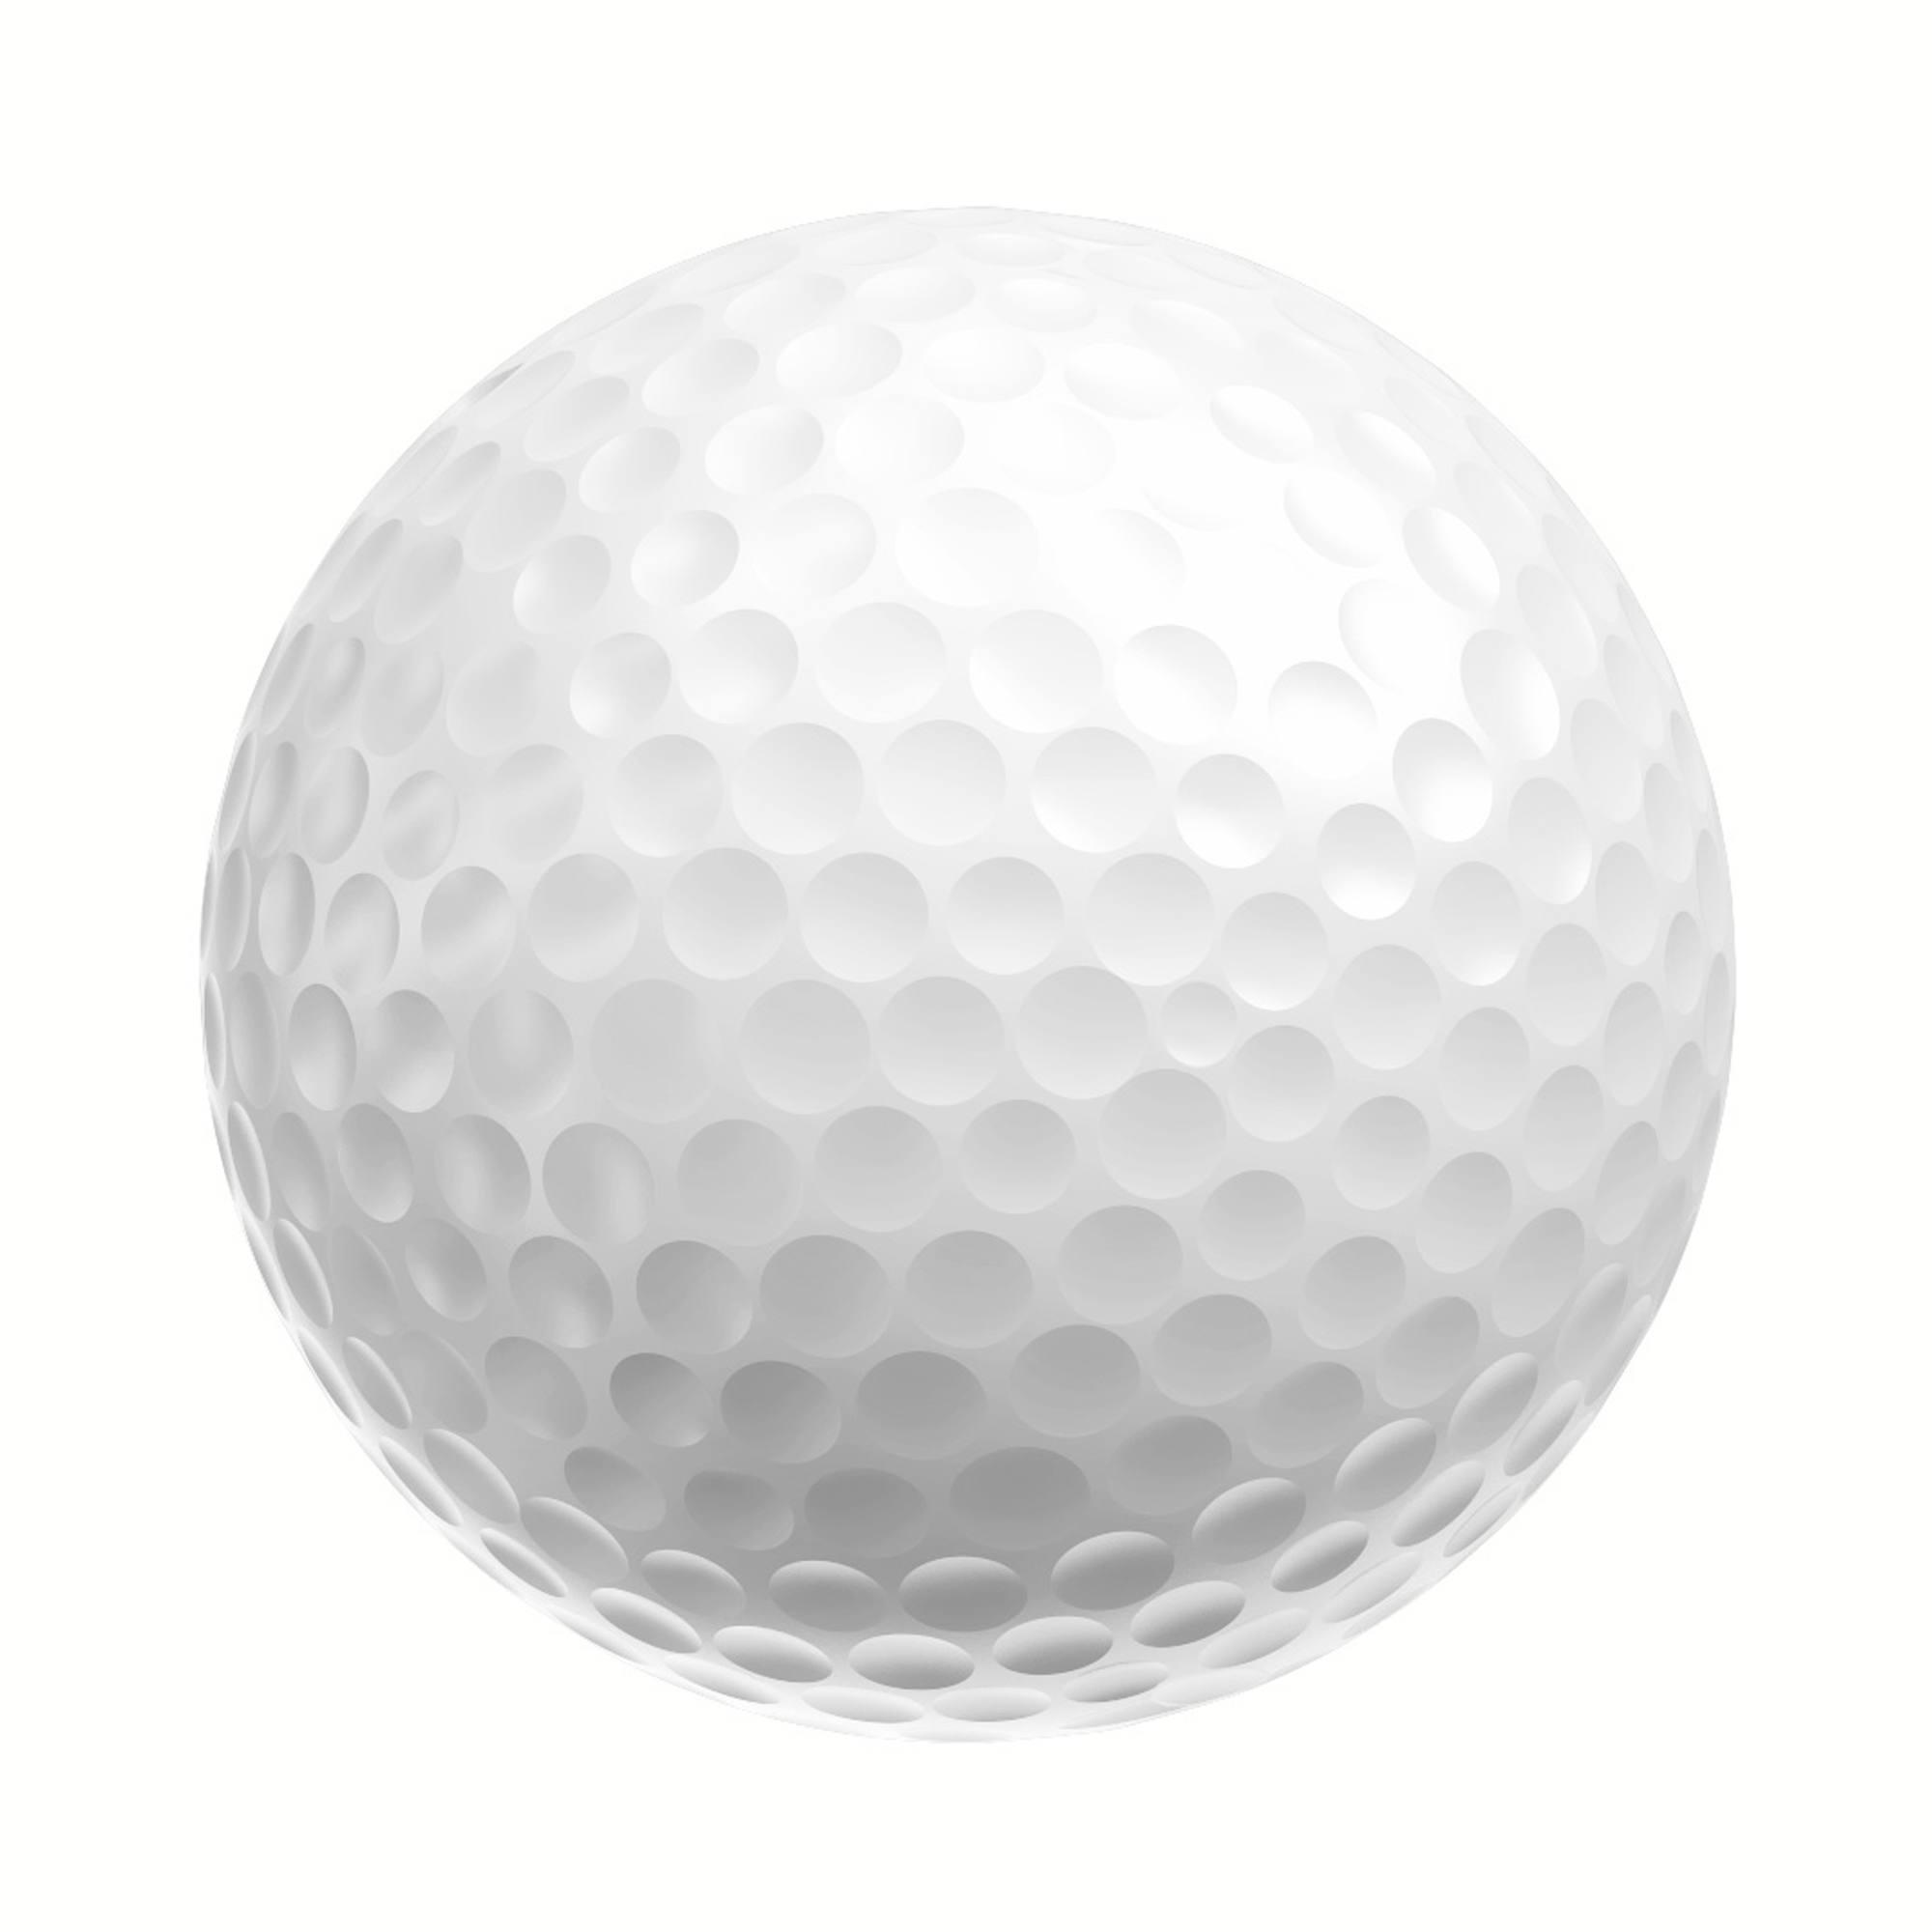 12 balles long blanches clubs collectivit s decathlon pro. Black Bedroom Furniture Sets. Home Design Ideas